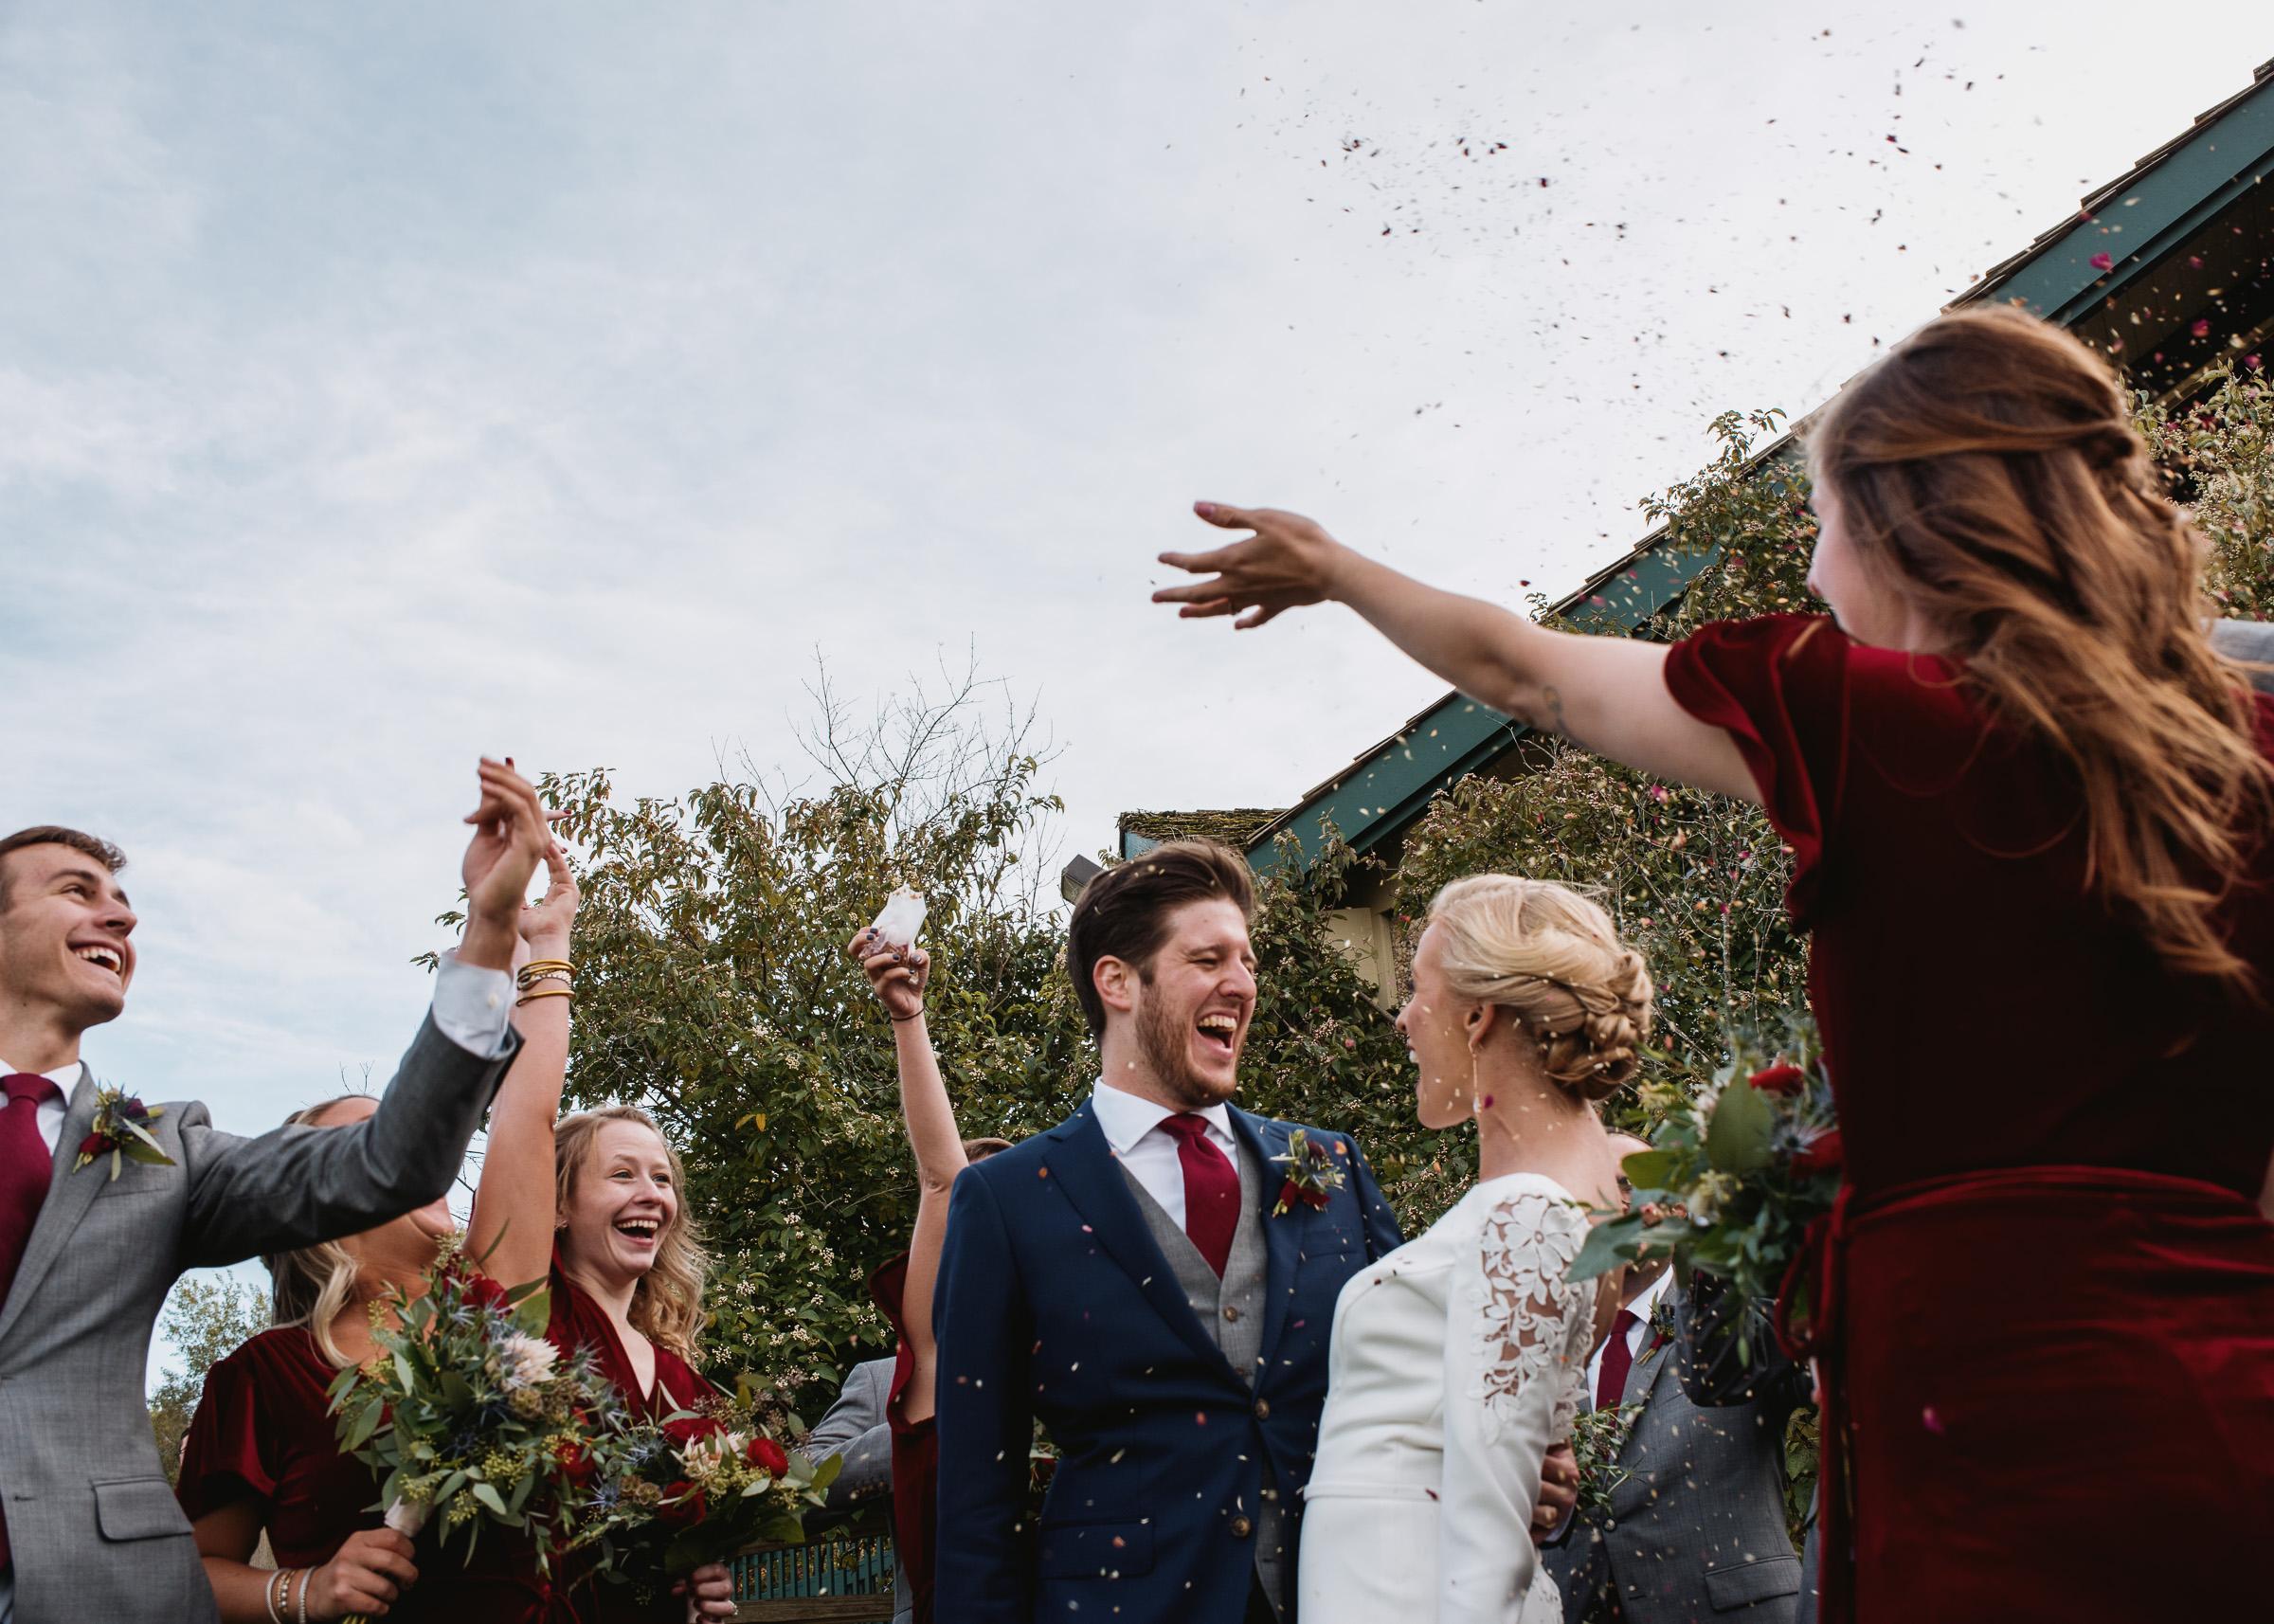 milwaukee-wedding-confetti-photographer (1 of 1)